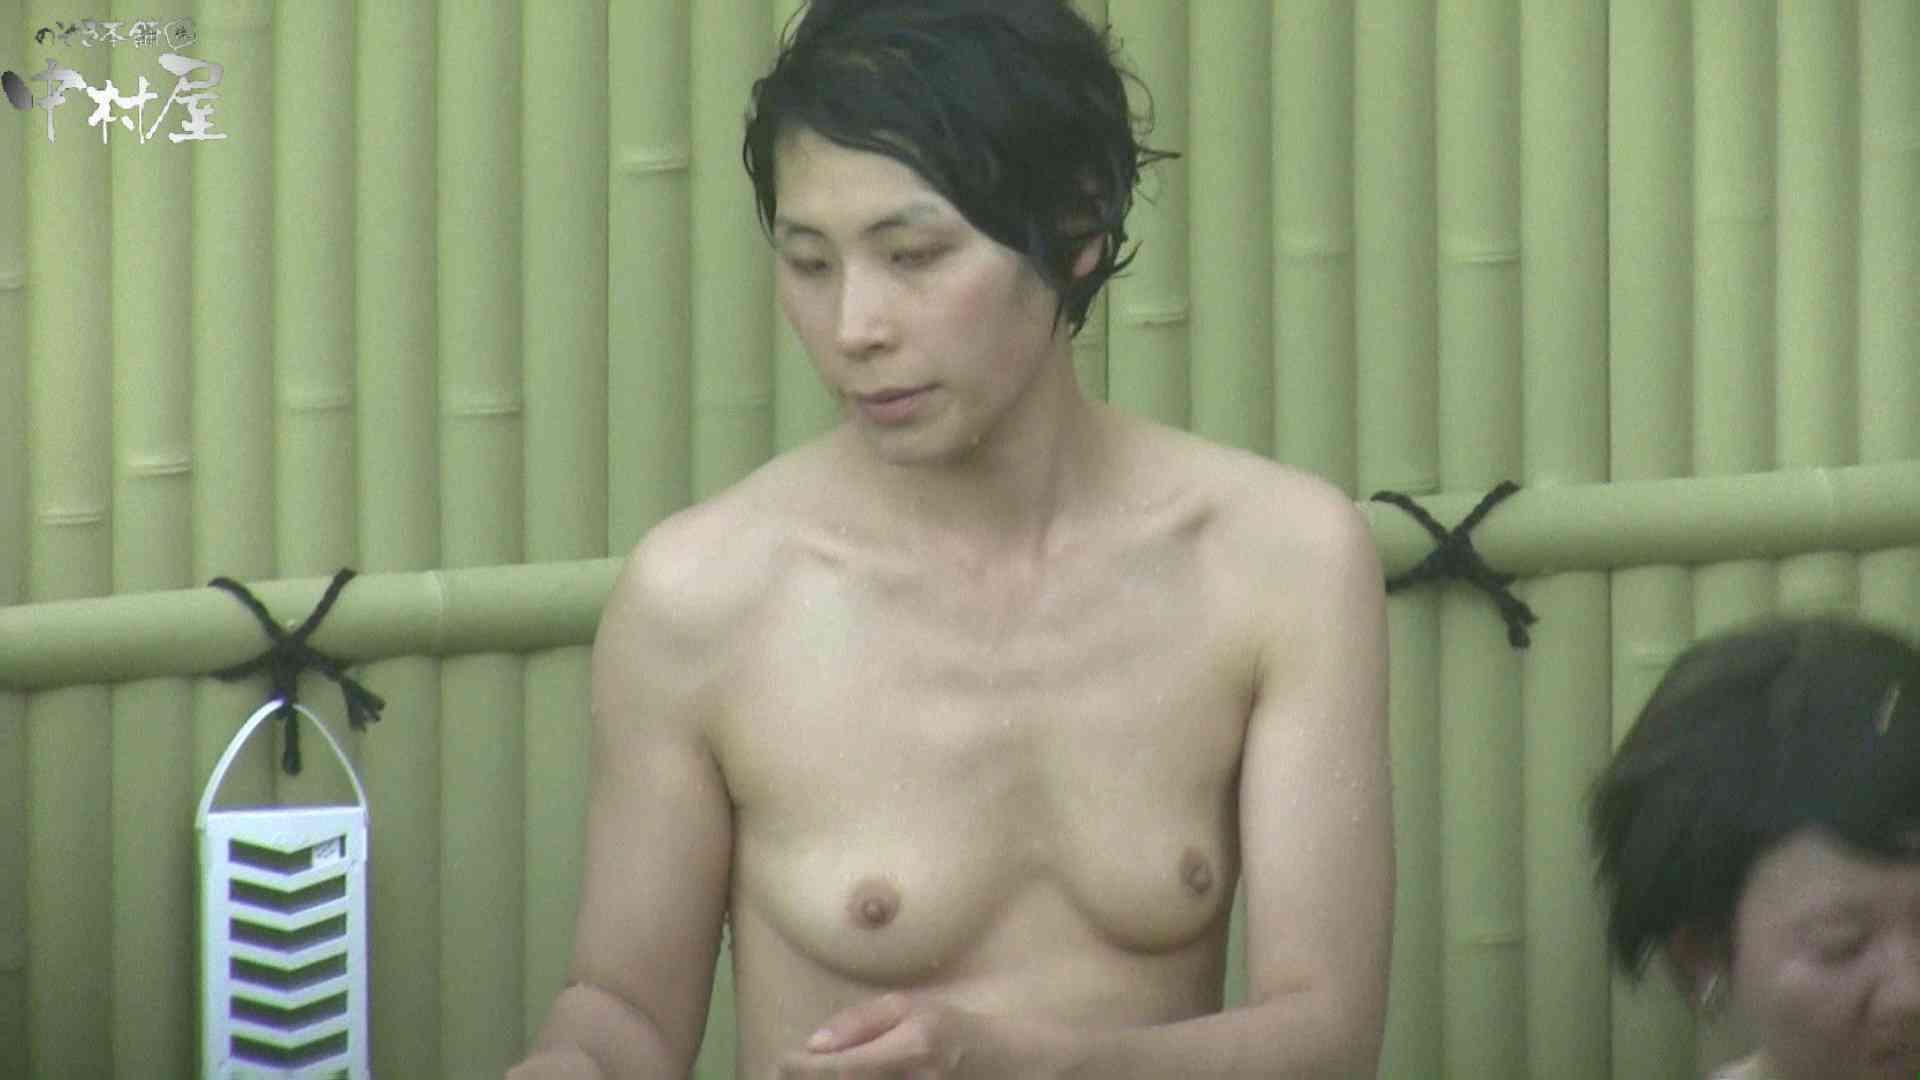 Aquaな露天風呂Vol.970 露天 | OLセックス  97画像 58